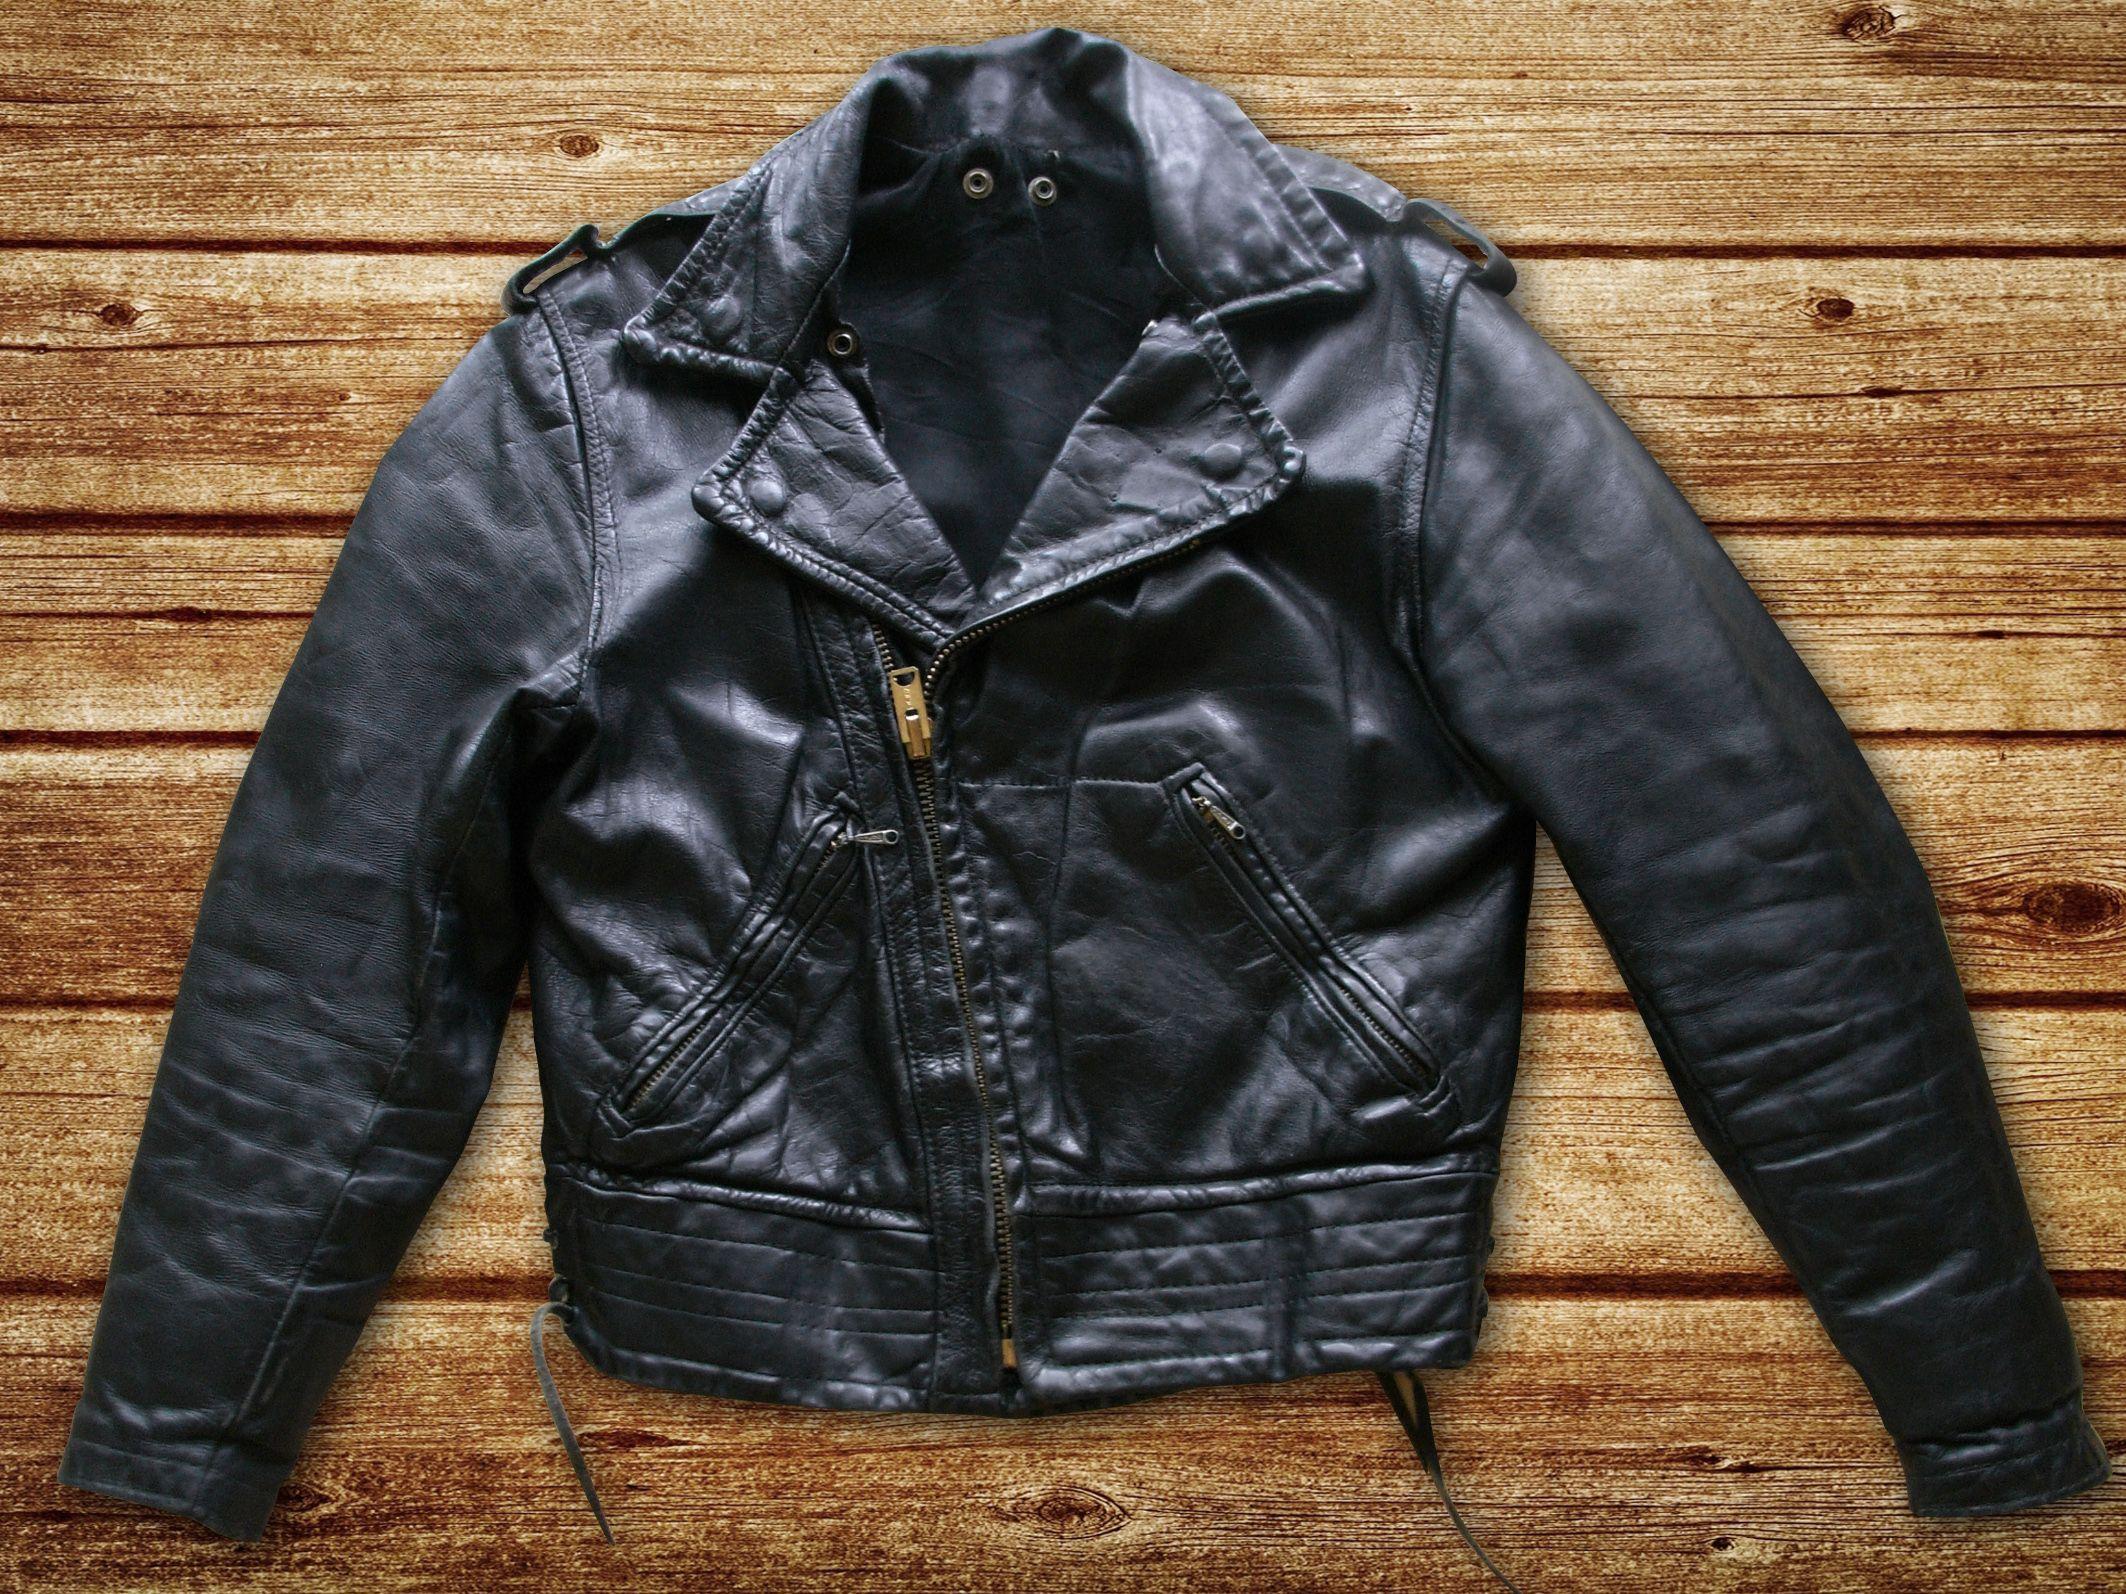 50s 60s Arizona Highway Patrol Motorcycle Jacket Sz 38 Jackets Leather Jacket Leather Jackets For Sale